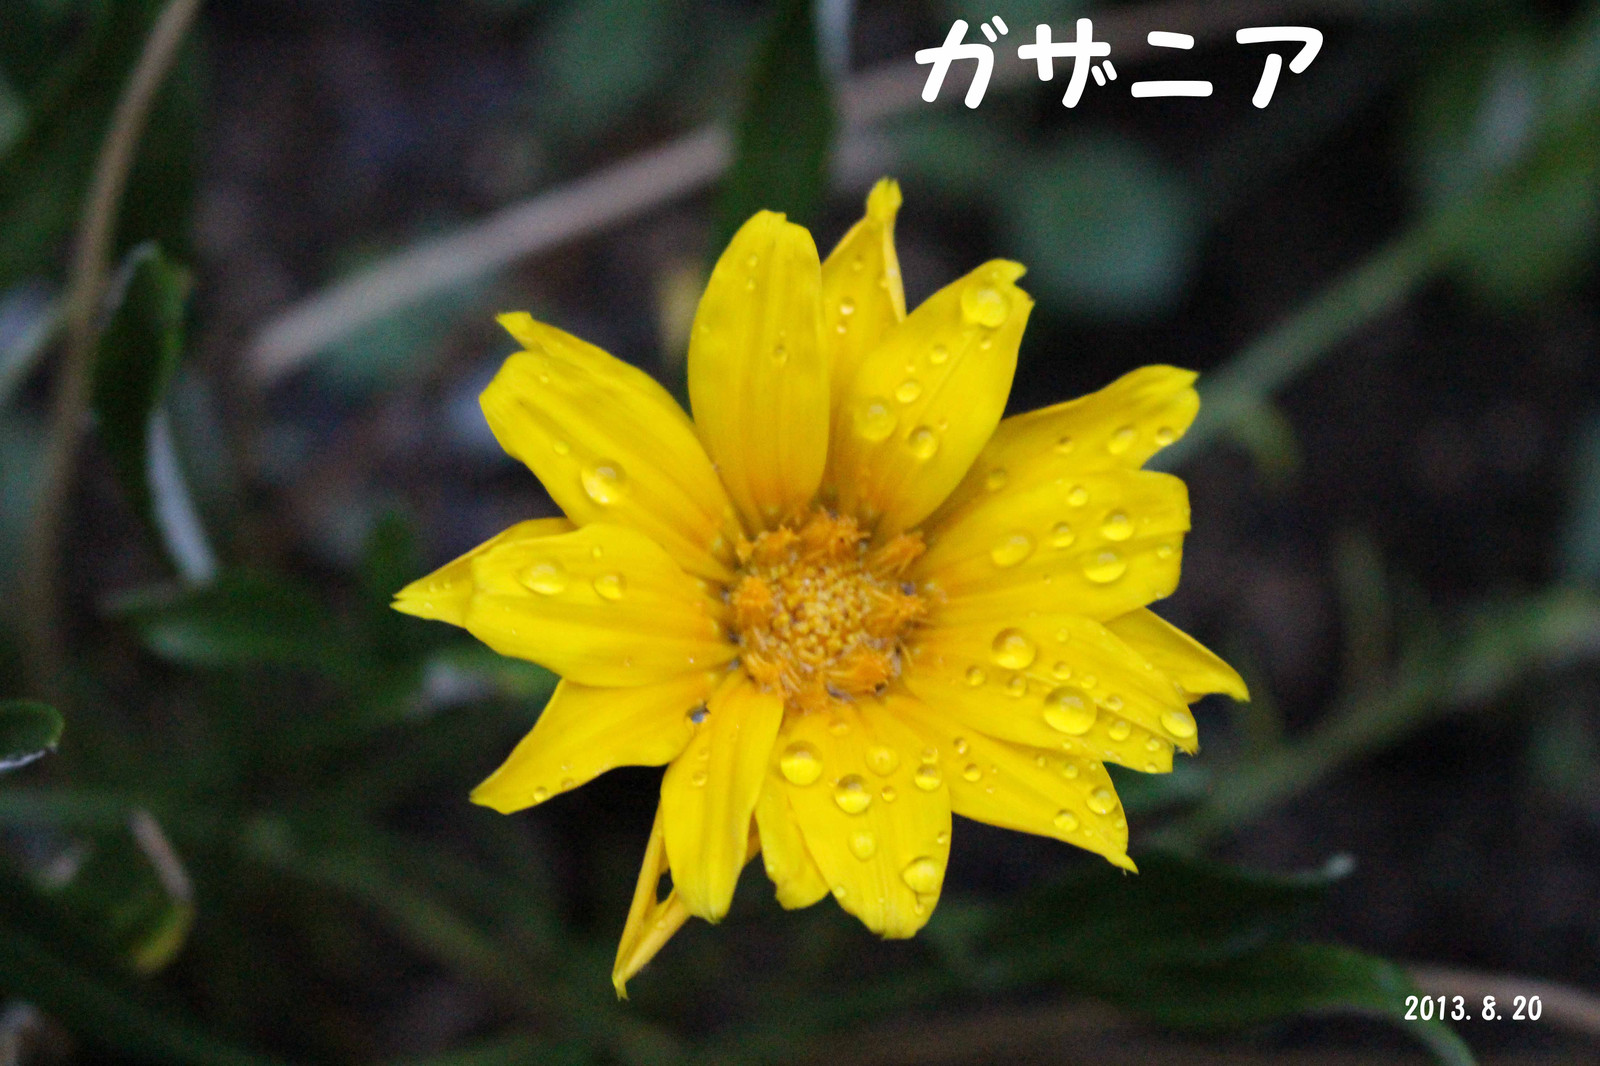 2013_08_20_1943_edited1